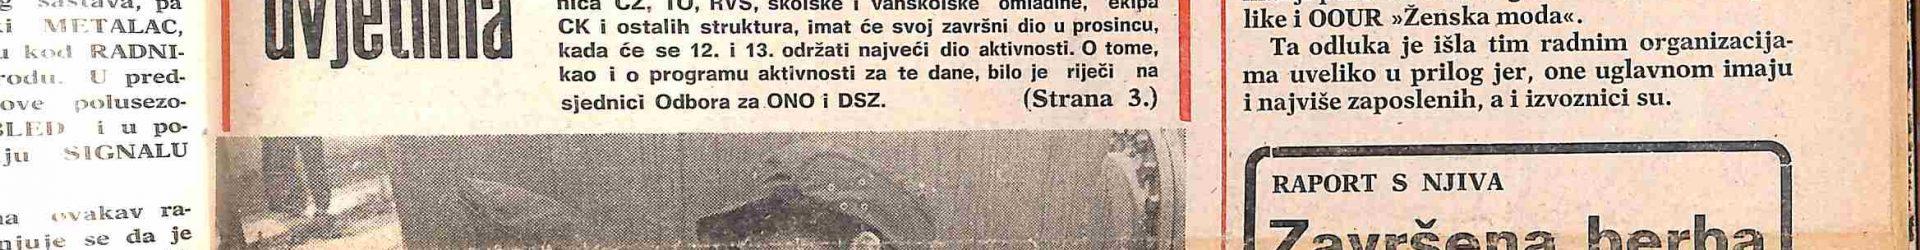 5 studeni 1981_Page_1